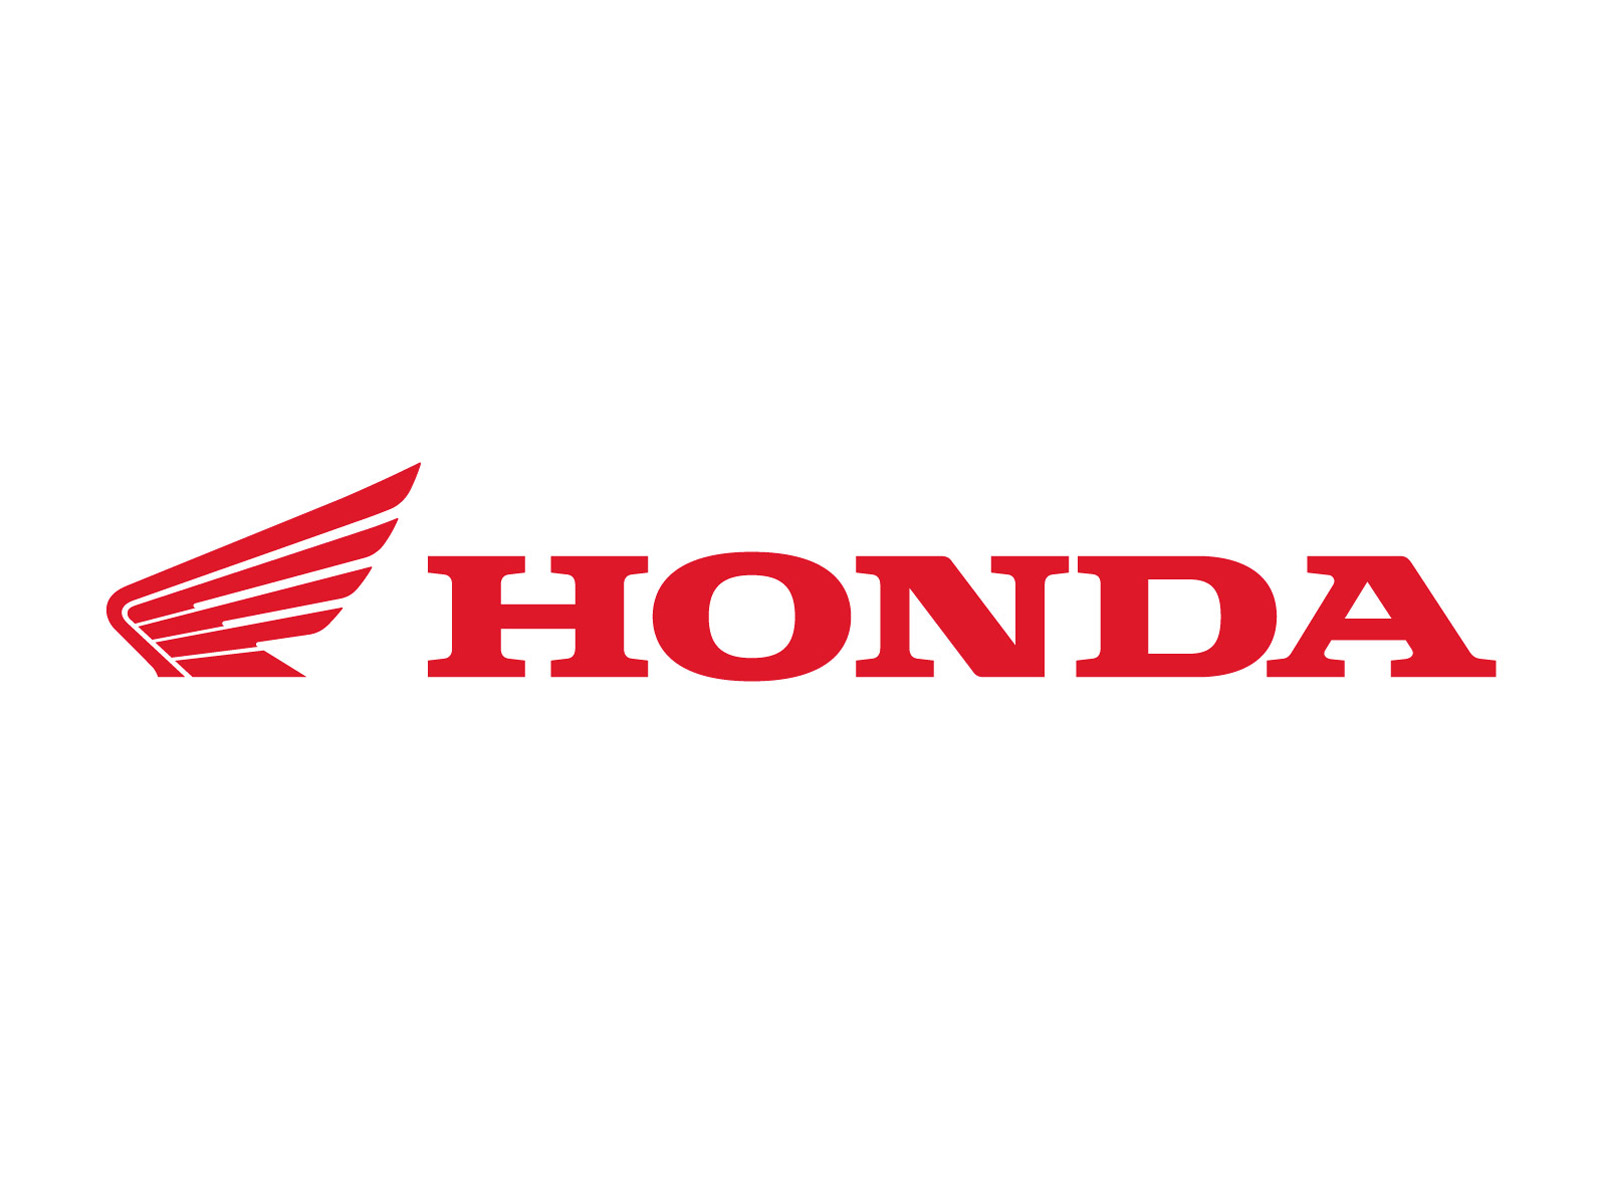 Honda Logo,honda logo vector,honda logo history,honda logo png,honda logo  font,honda logo floor mats,honda logo fabric,honda logo wallpaper,honda logo  PlusPng.com  - Honda Logo Vector PNG